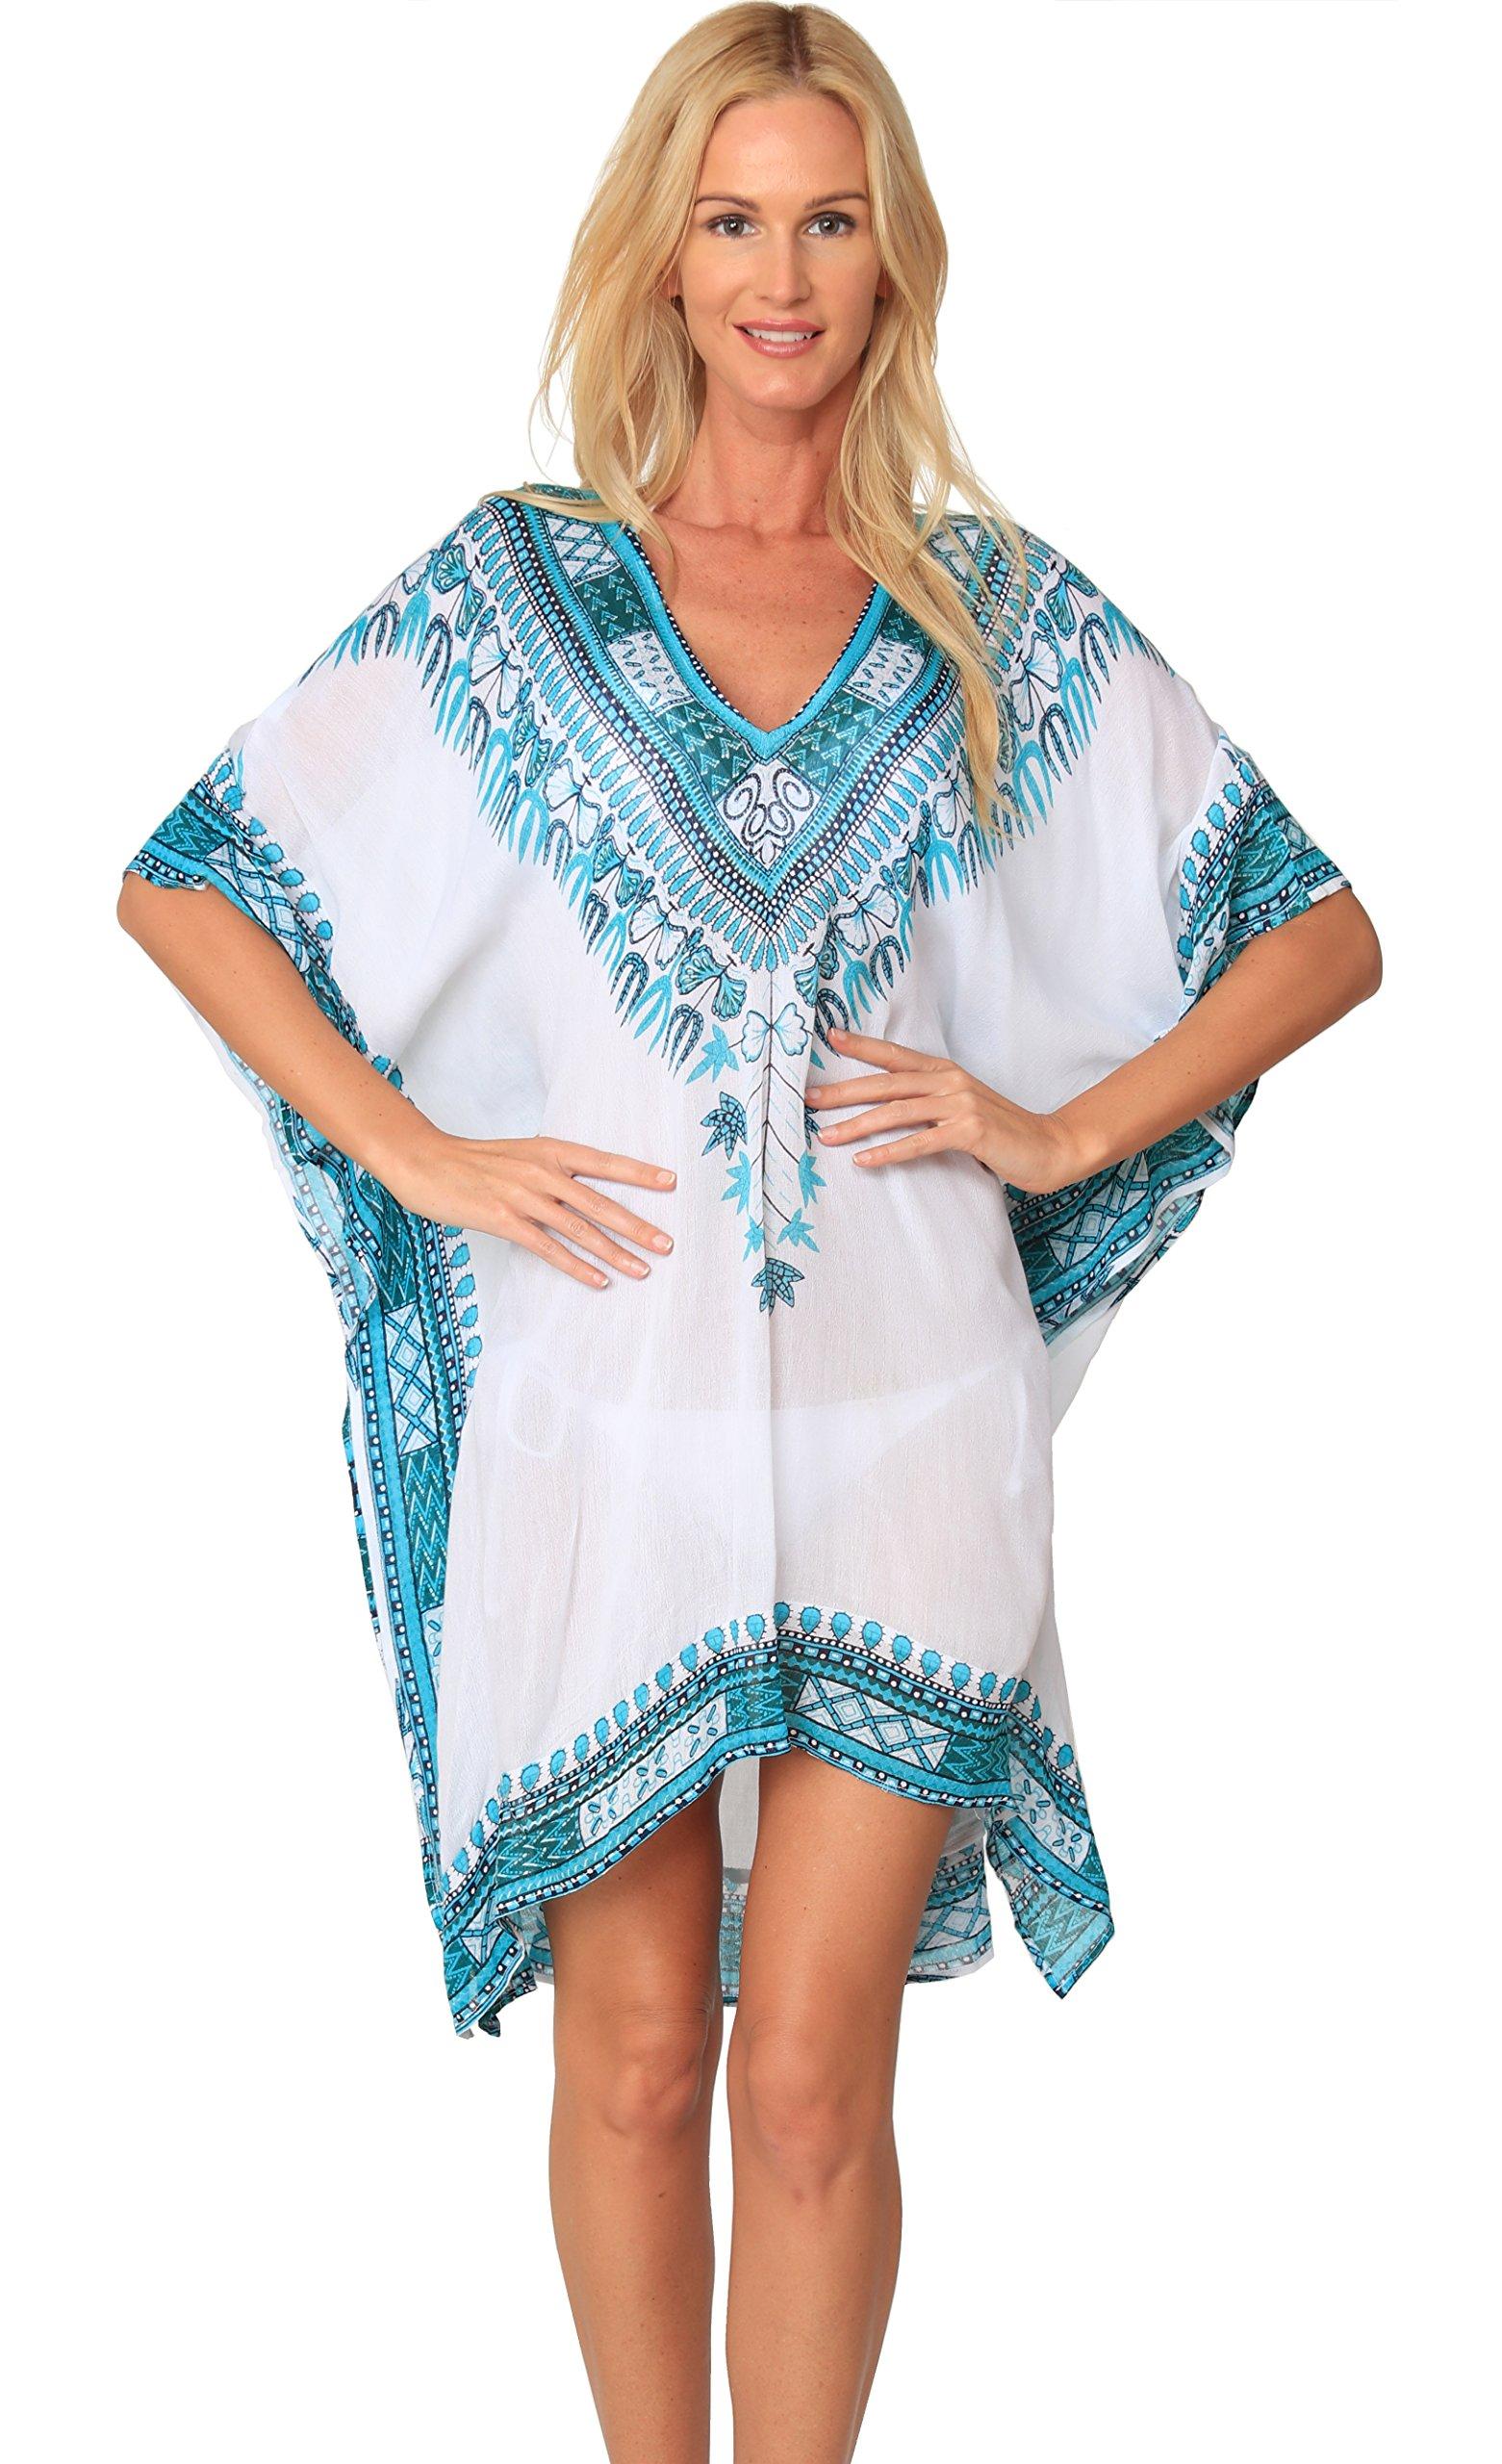 INGEAR Fashion Cover Up Summer Hawaiian Poncho Print Tunic Hem Tops Beachwear (One Size, Turquoise/White)